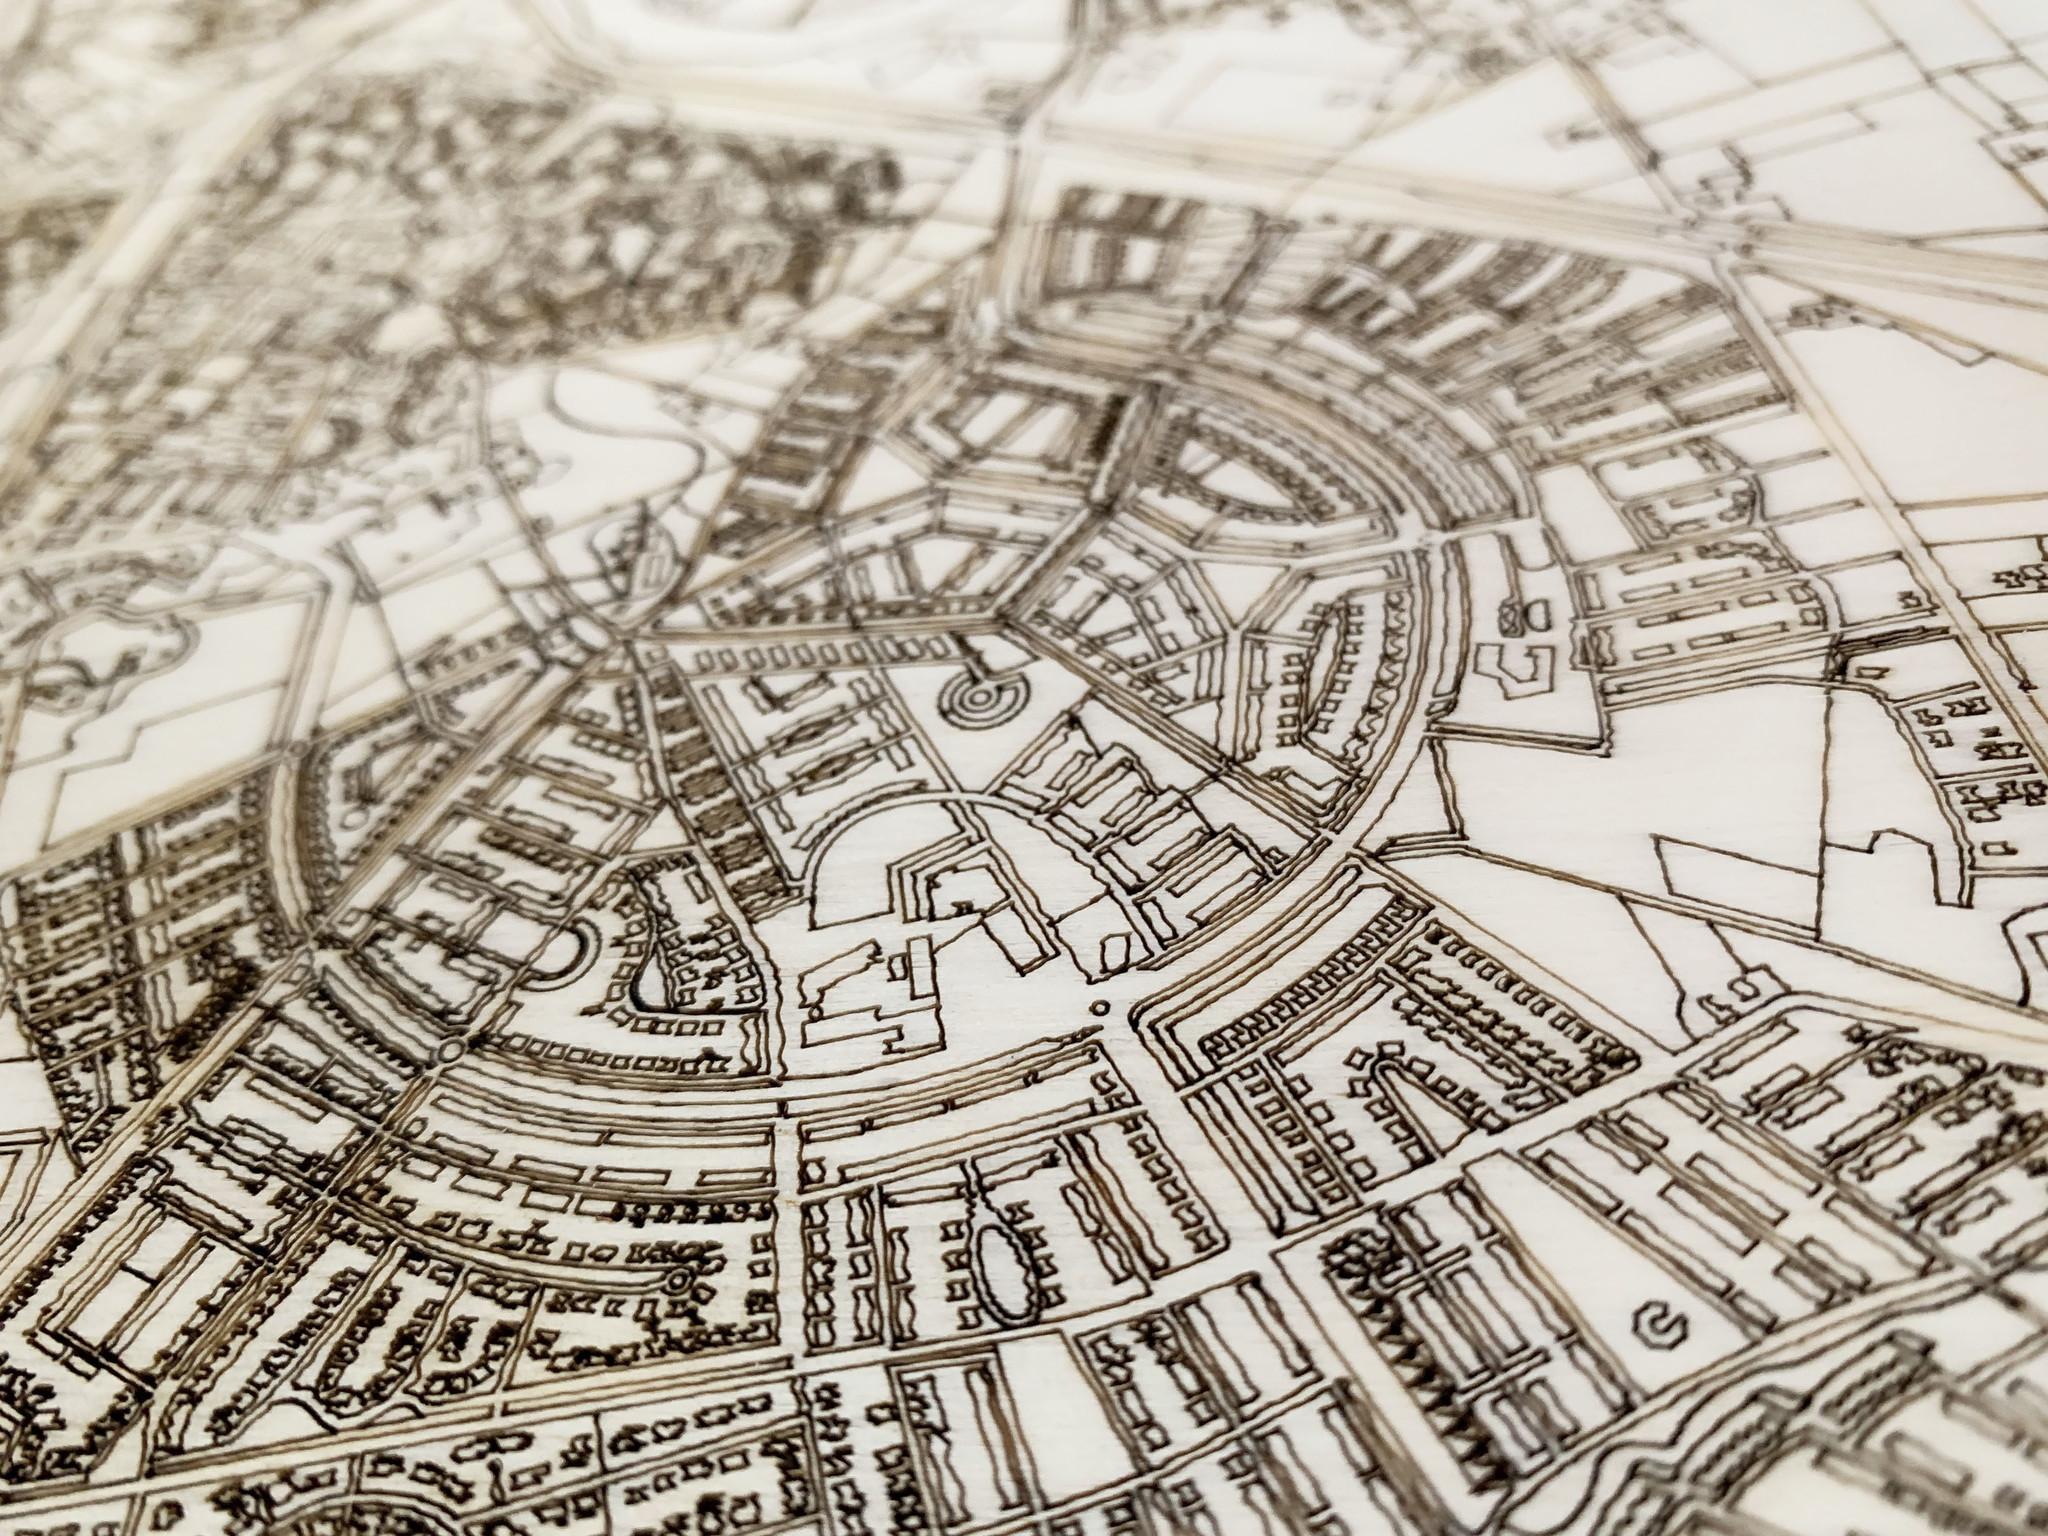 Citymap Siena | houten wanddecoratie-3